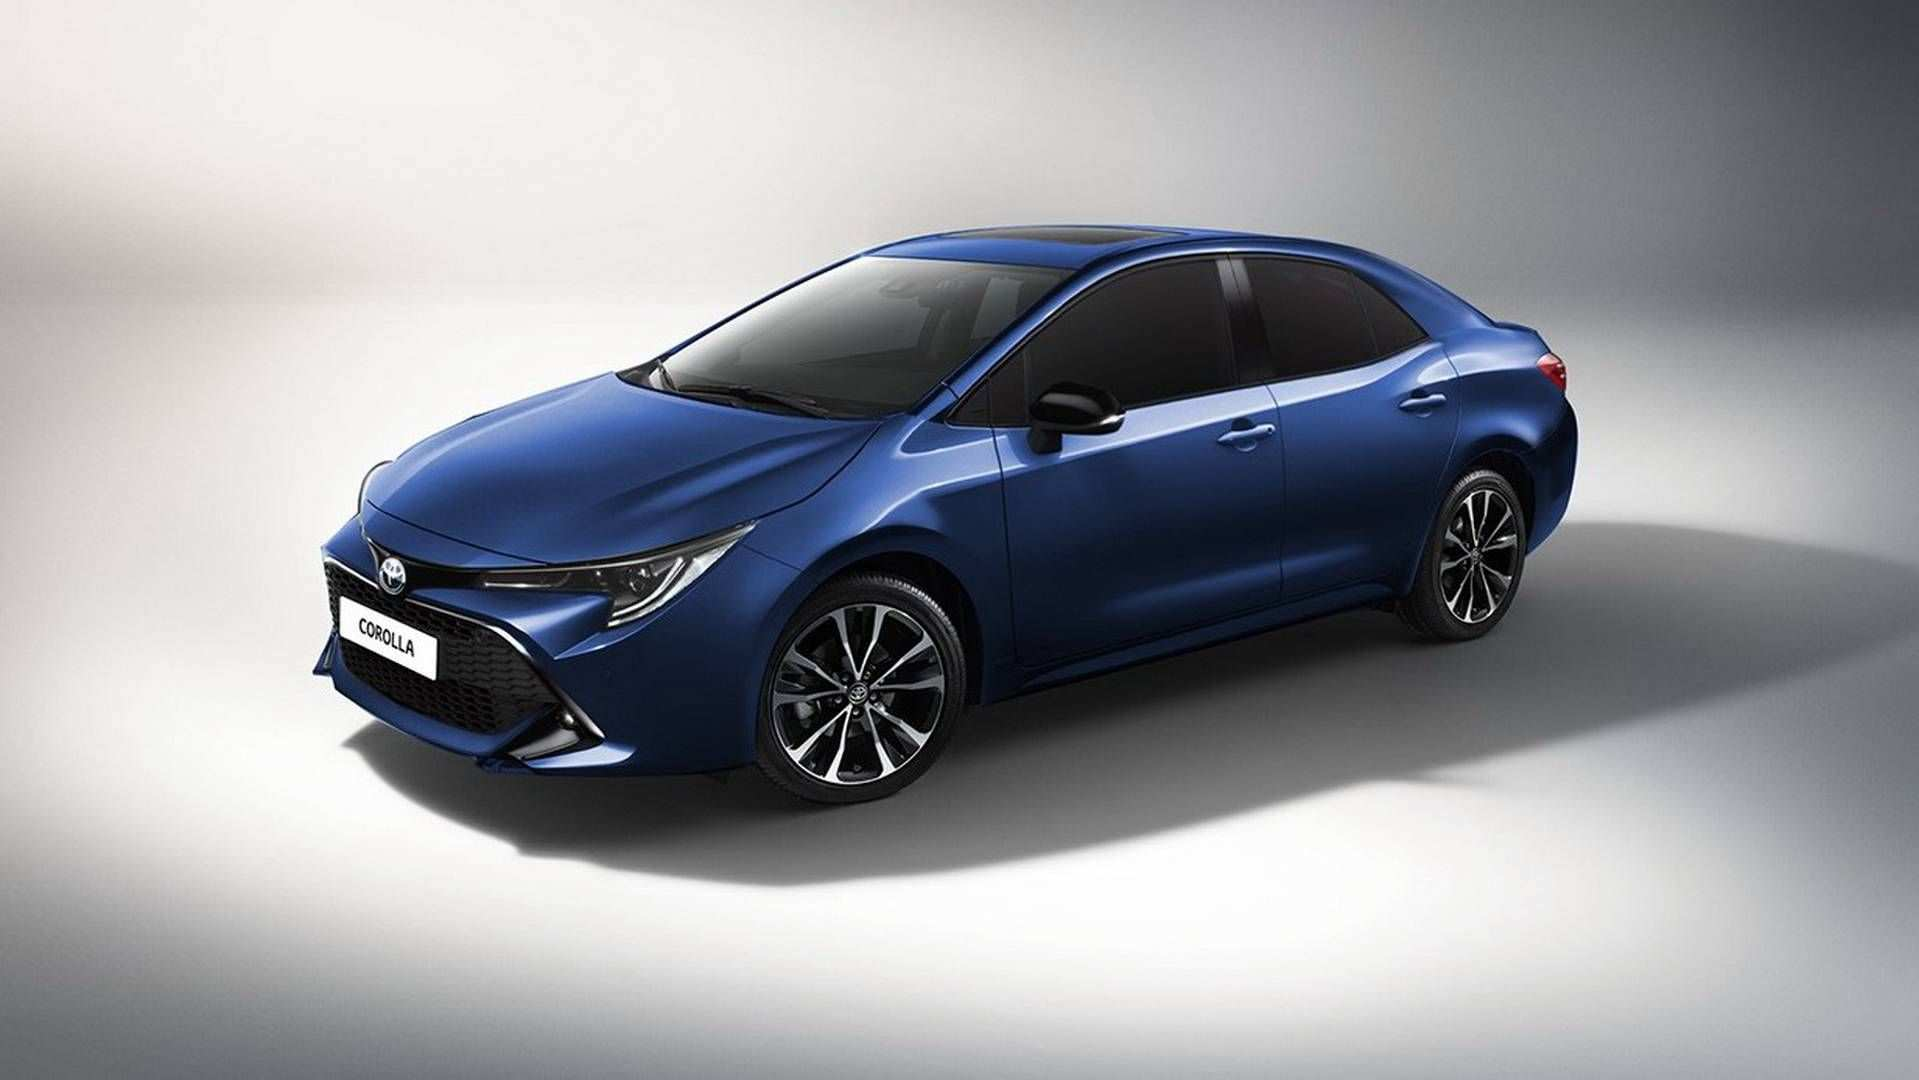 21 New Toyota 2020 Gli Ratings with Toyota 2020 Gli